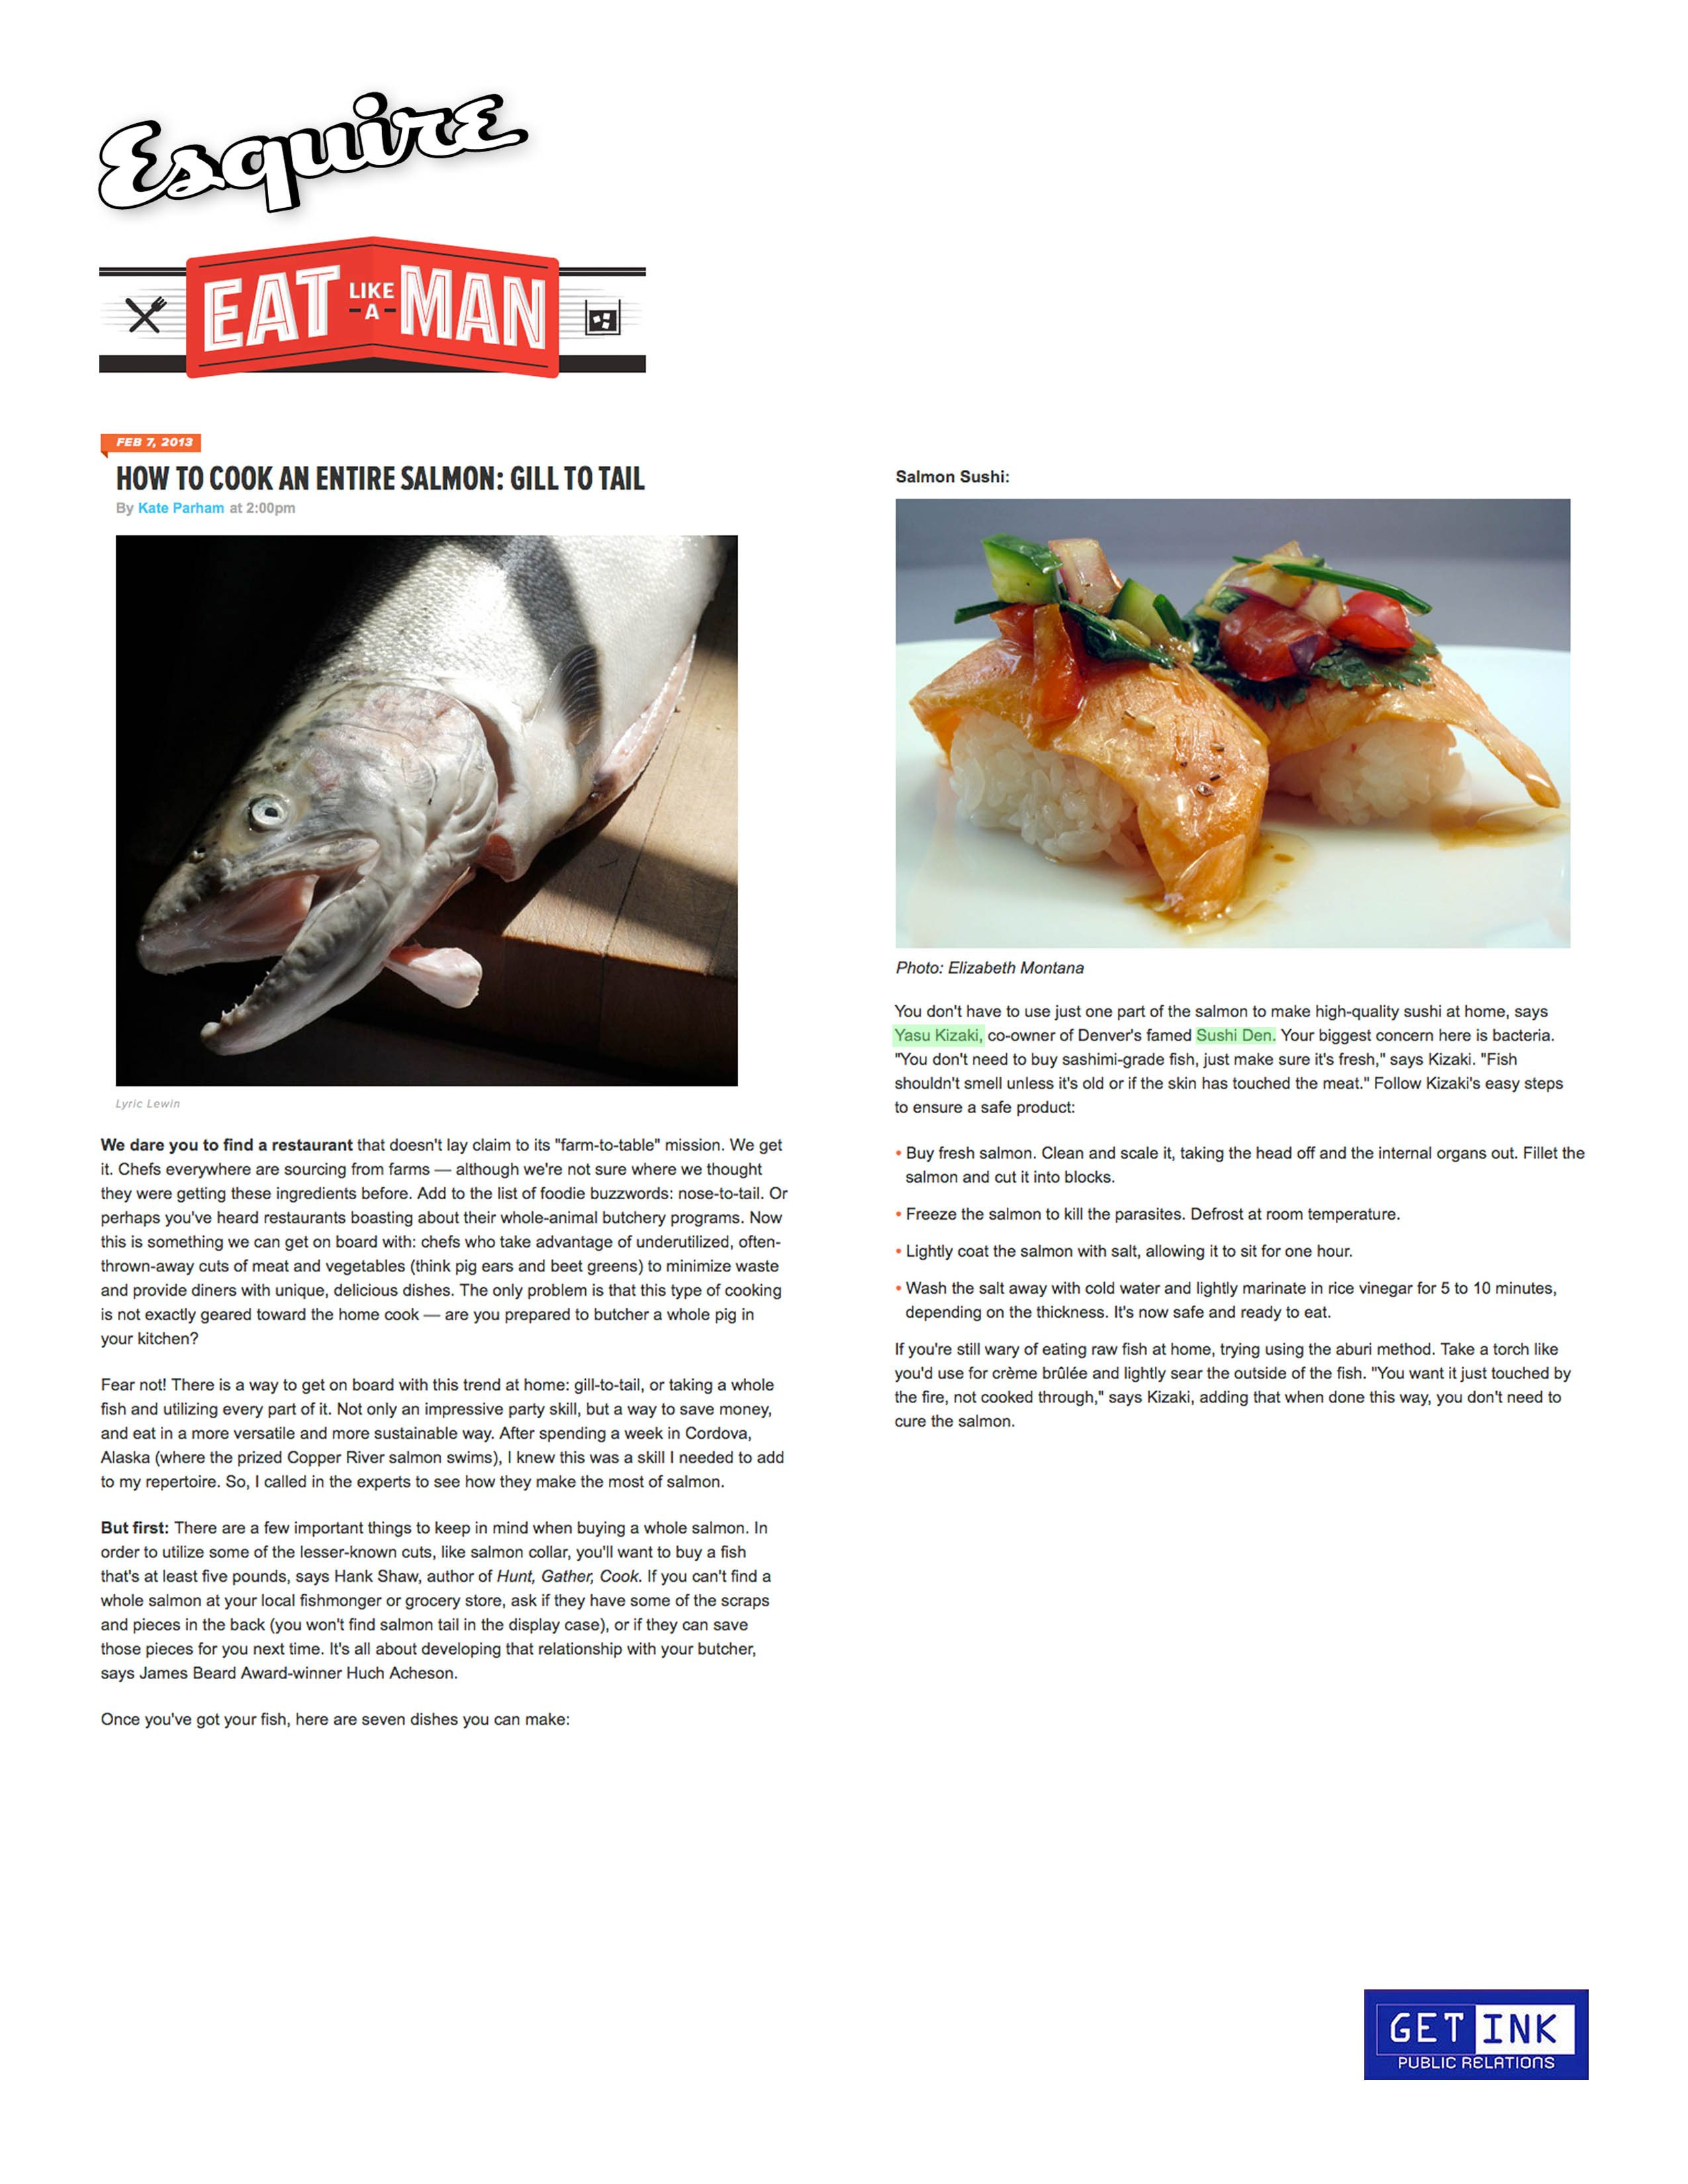 Sushi Den Denver Esquire magazine - Get Ink PR